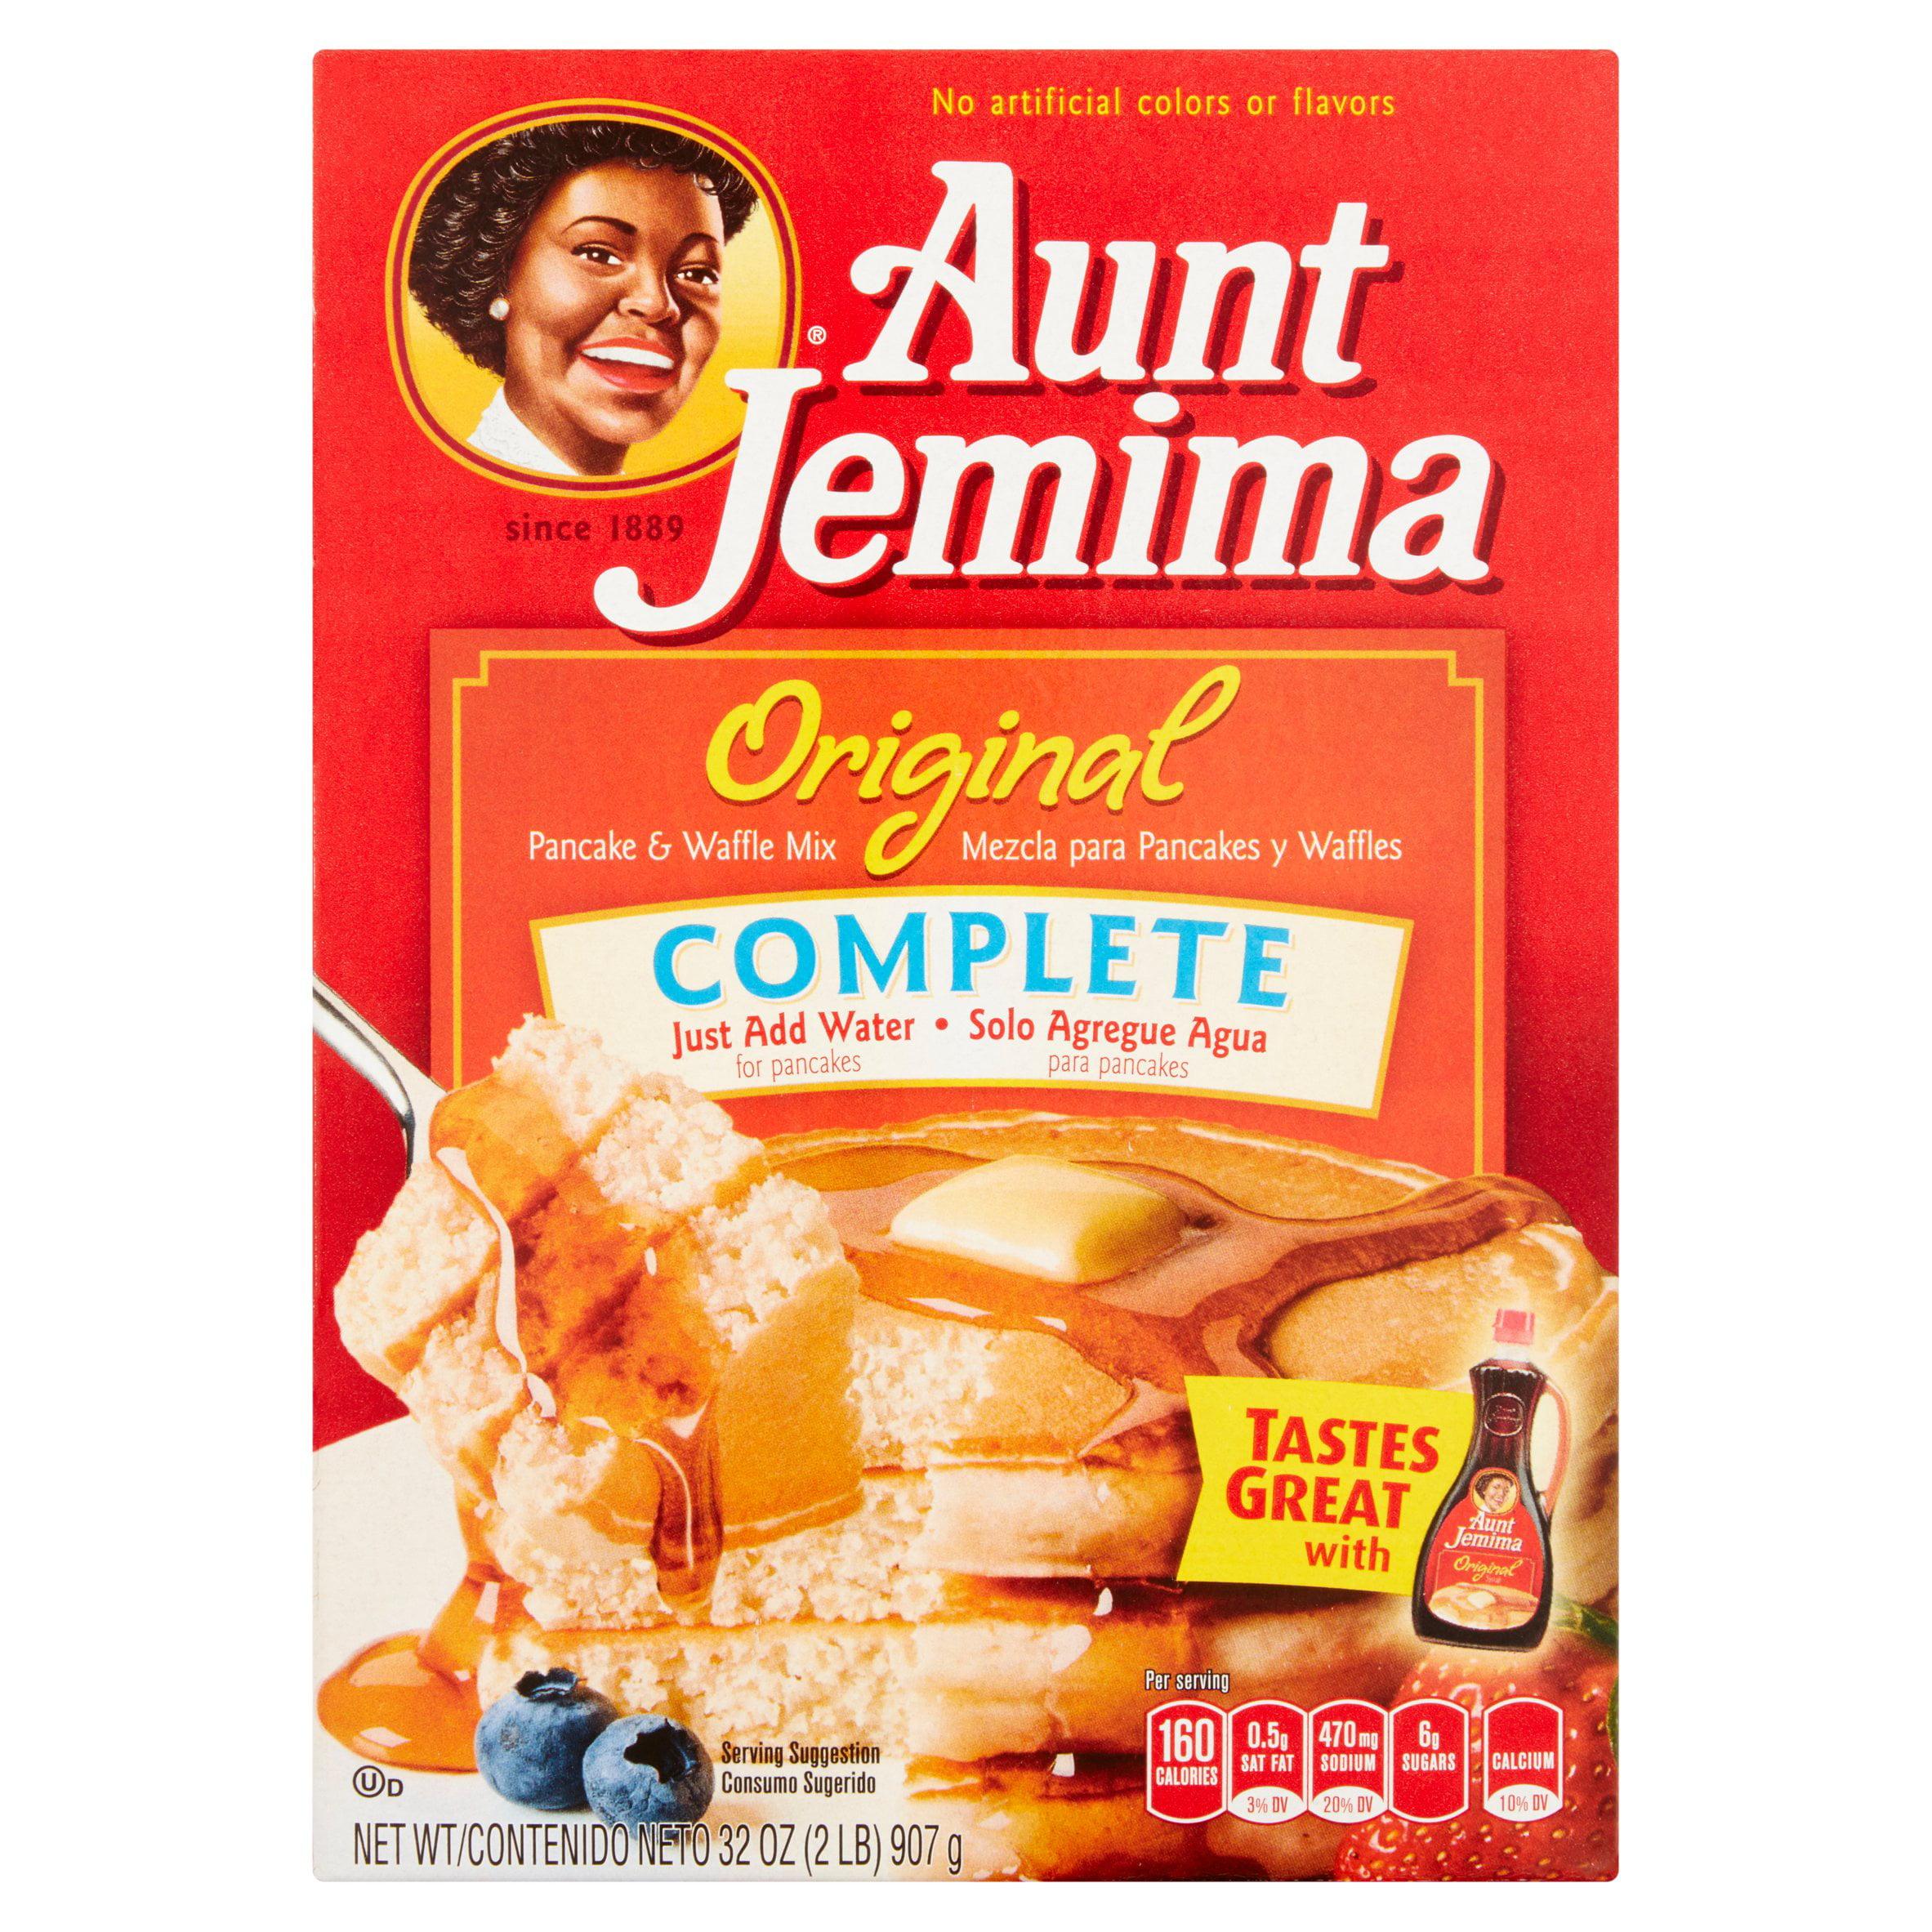 Aunt Jemima Original Complete Pancake & Waffle Mix, 32 oz by The Quaker Oats Company